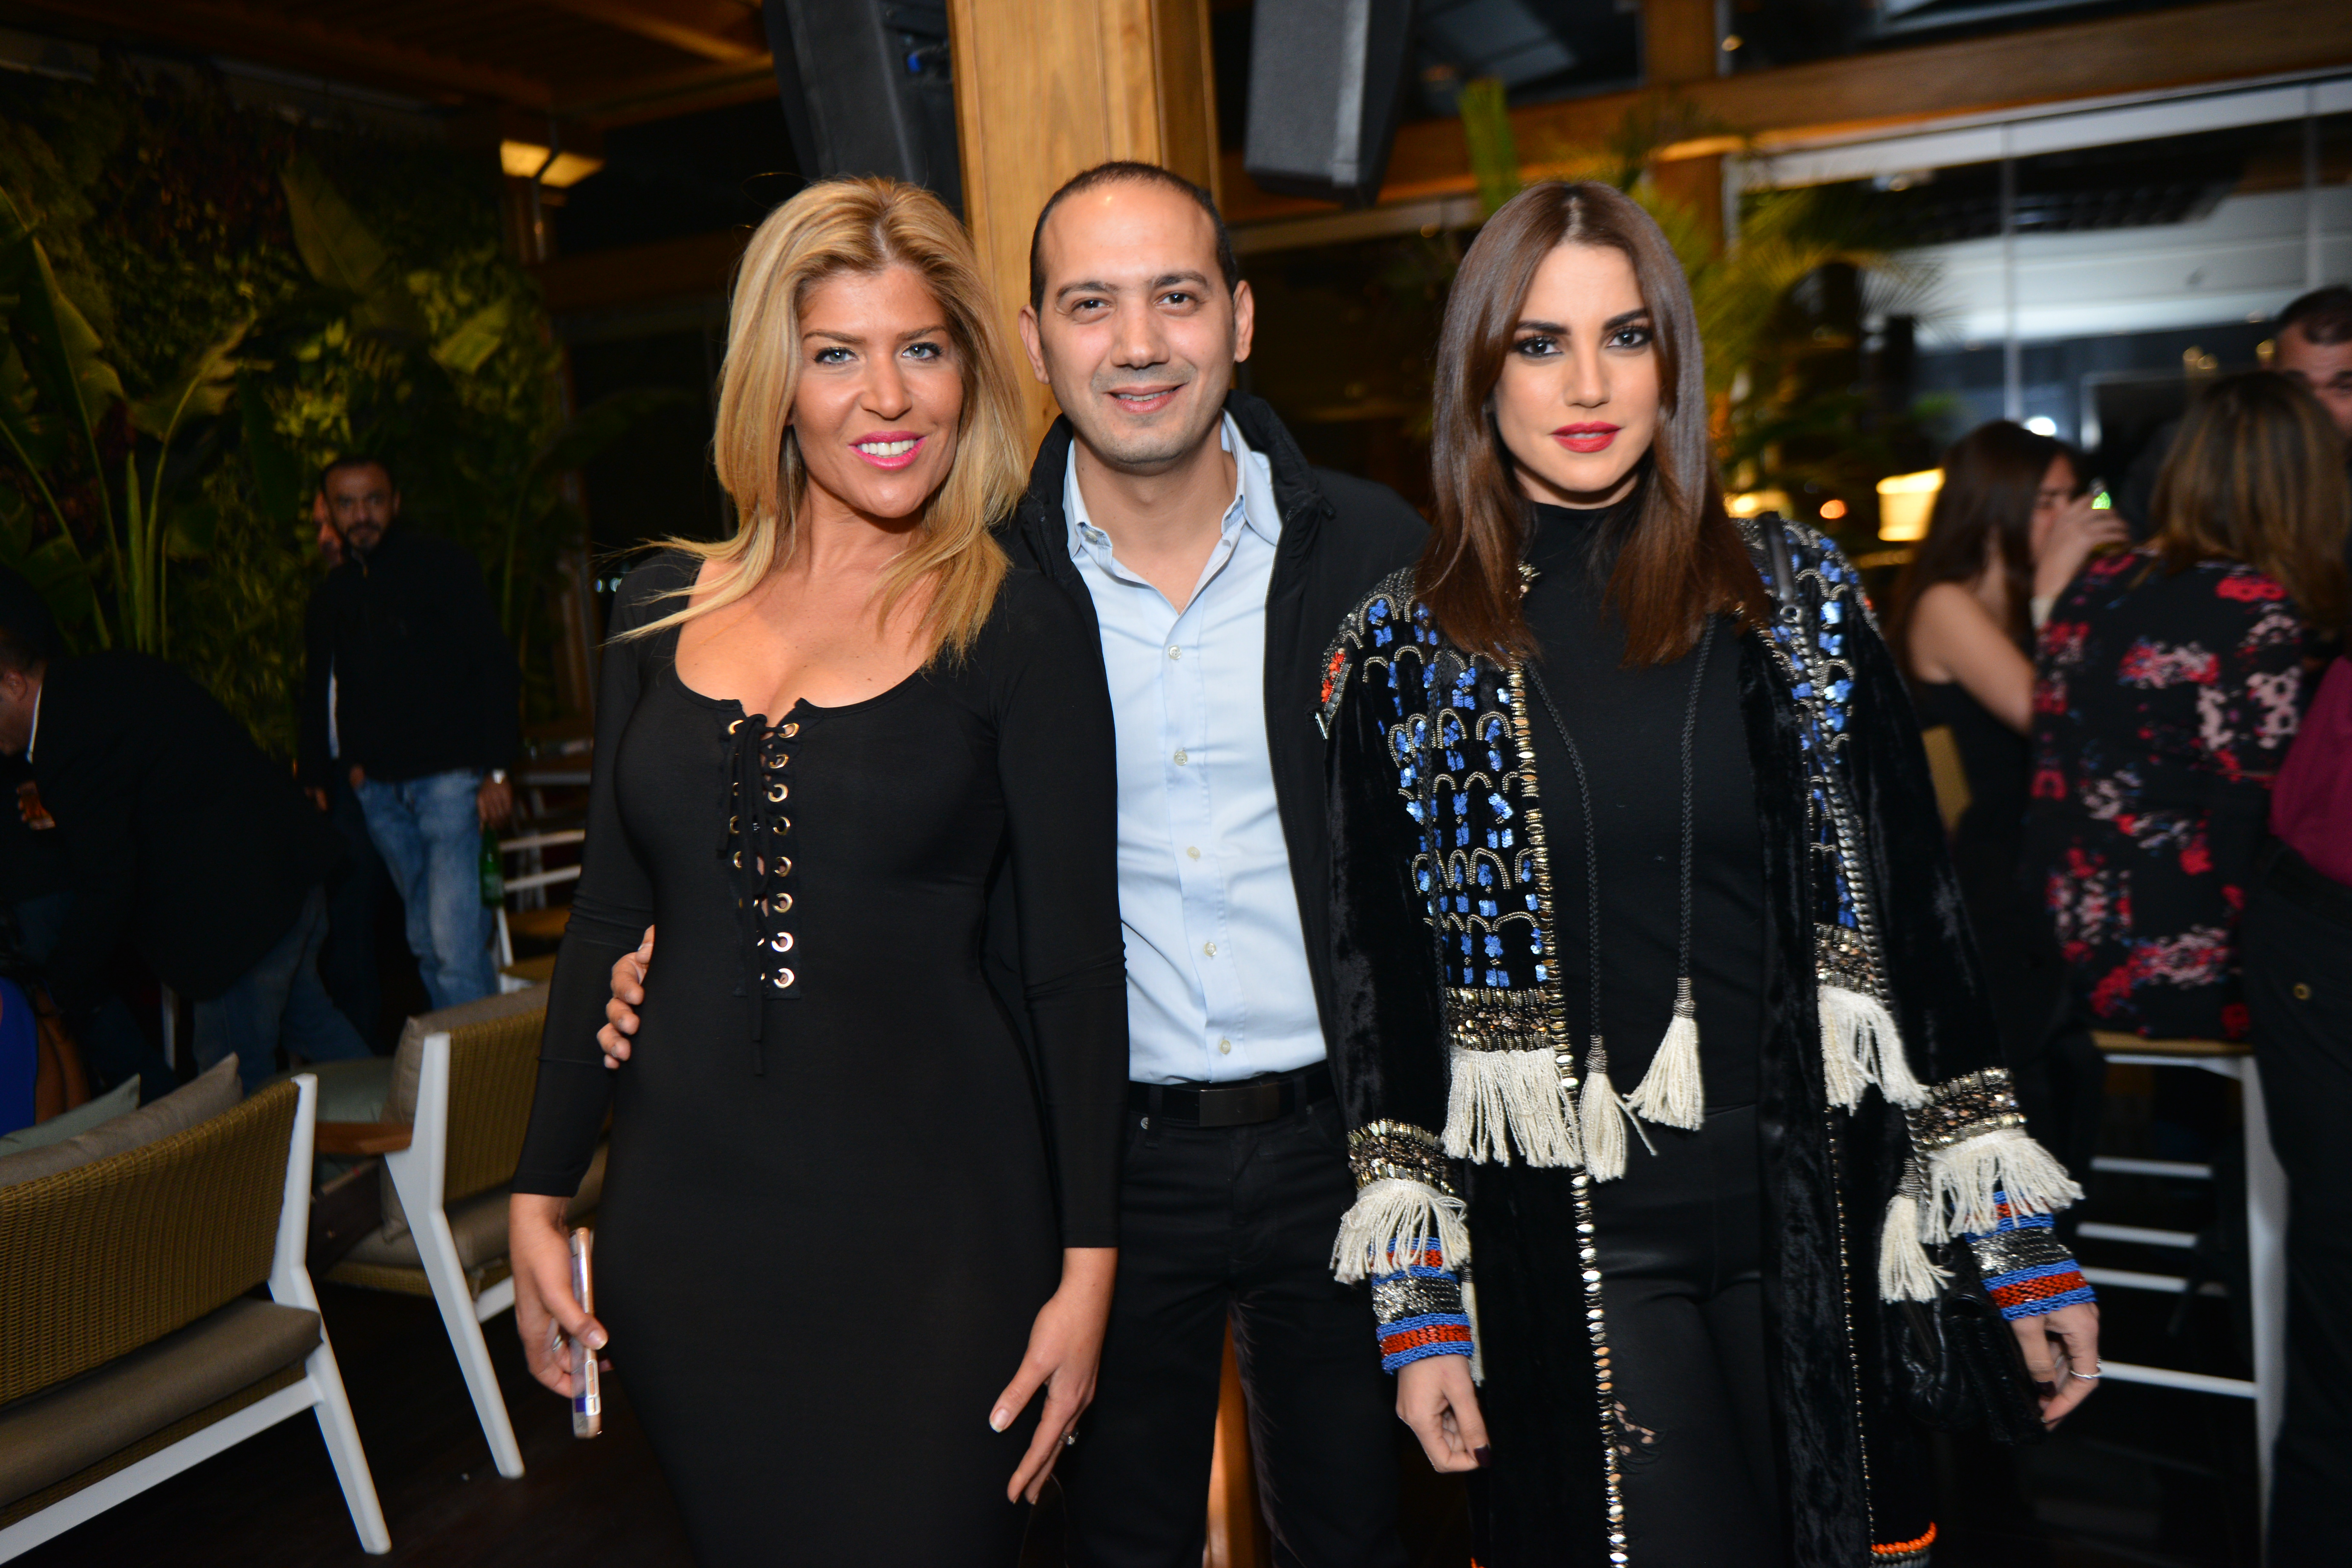 Ms. Caroline Simolian, Mr. Amr Assem & Dorra